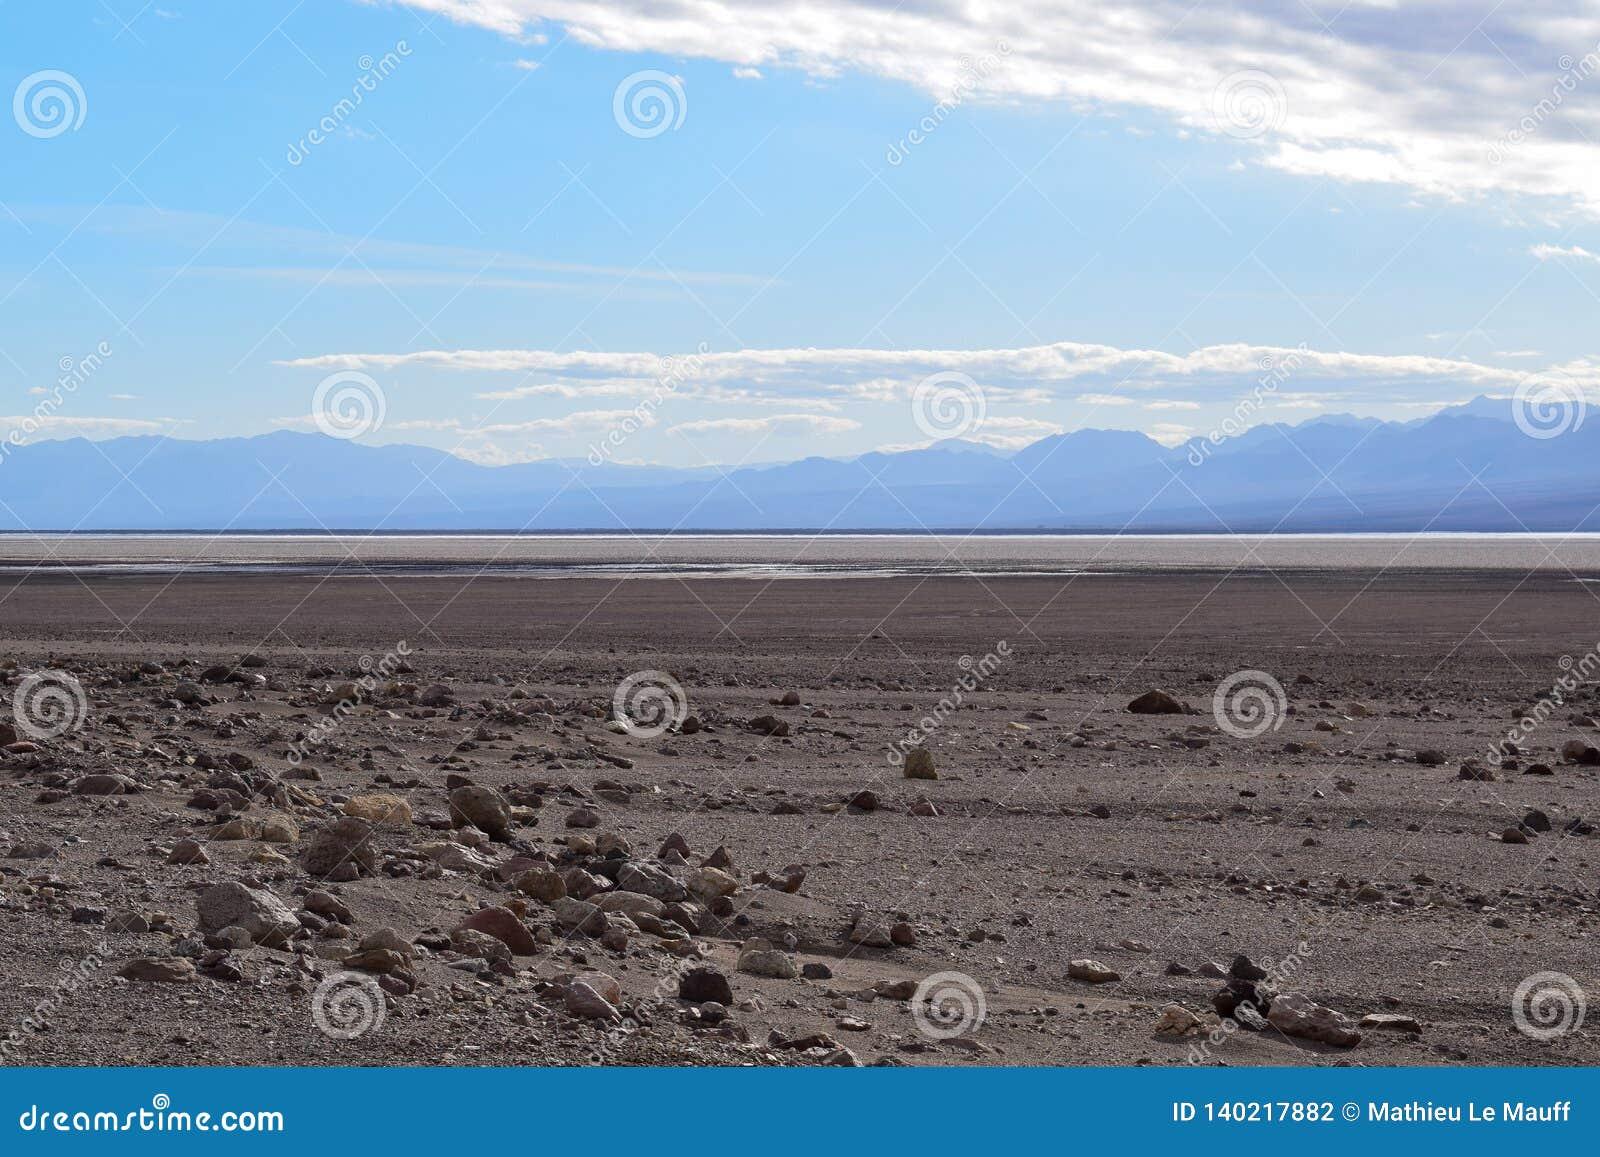 Doodsvallei - Eindeloze Woestijn